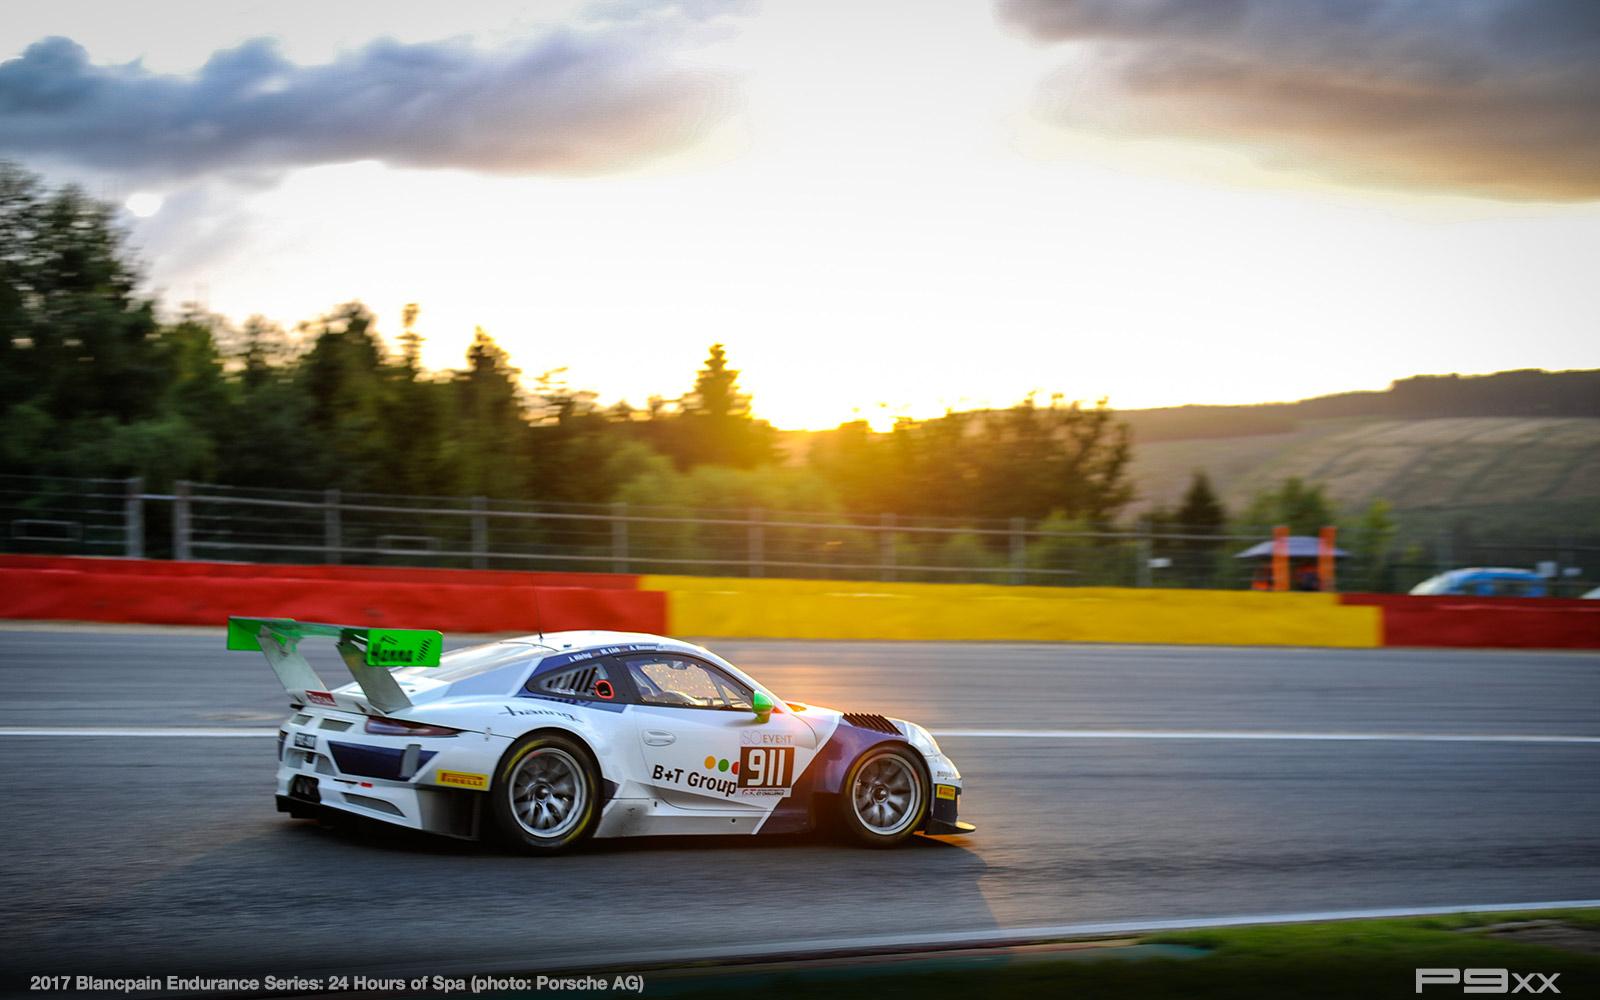 2017-24-Hours-of-Spa-Porsche-321